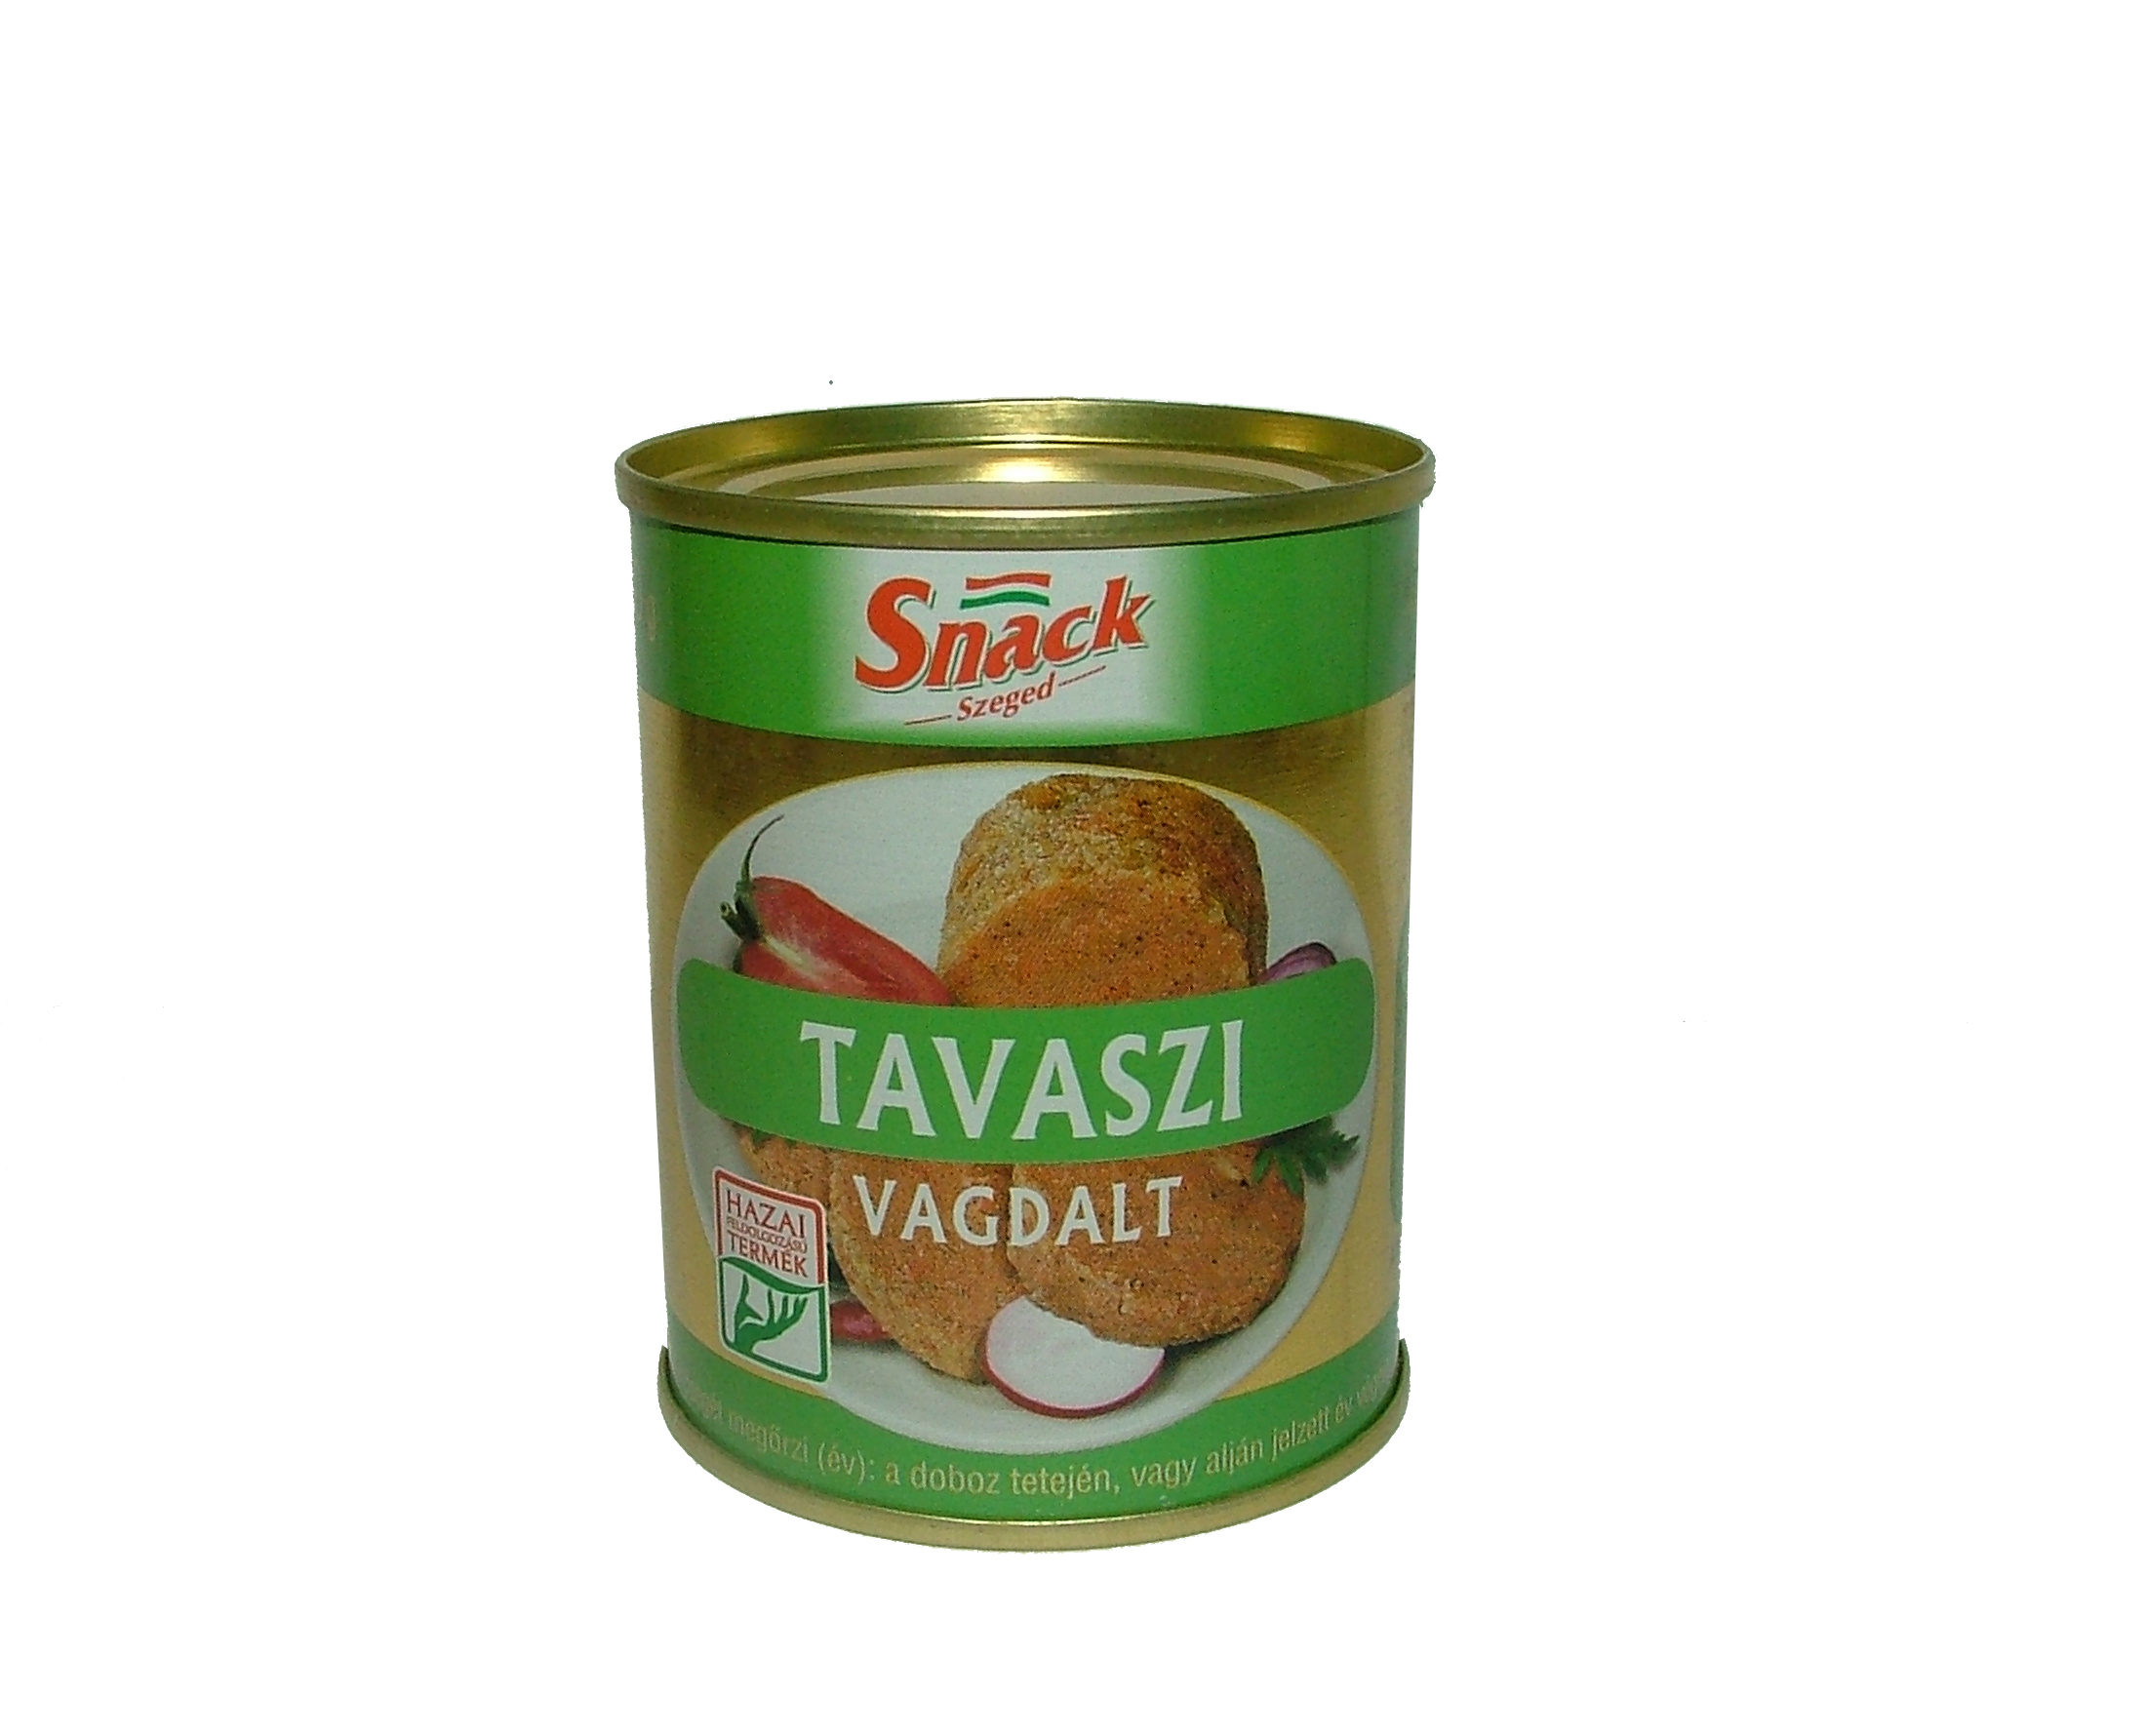 """Snack"" Tavaszi vagdalt 130g"